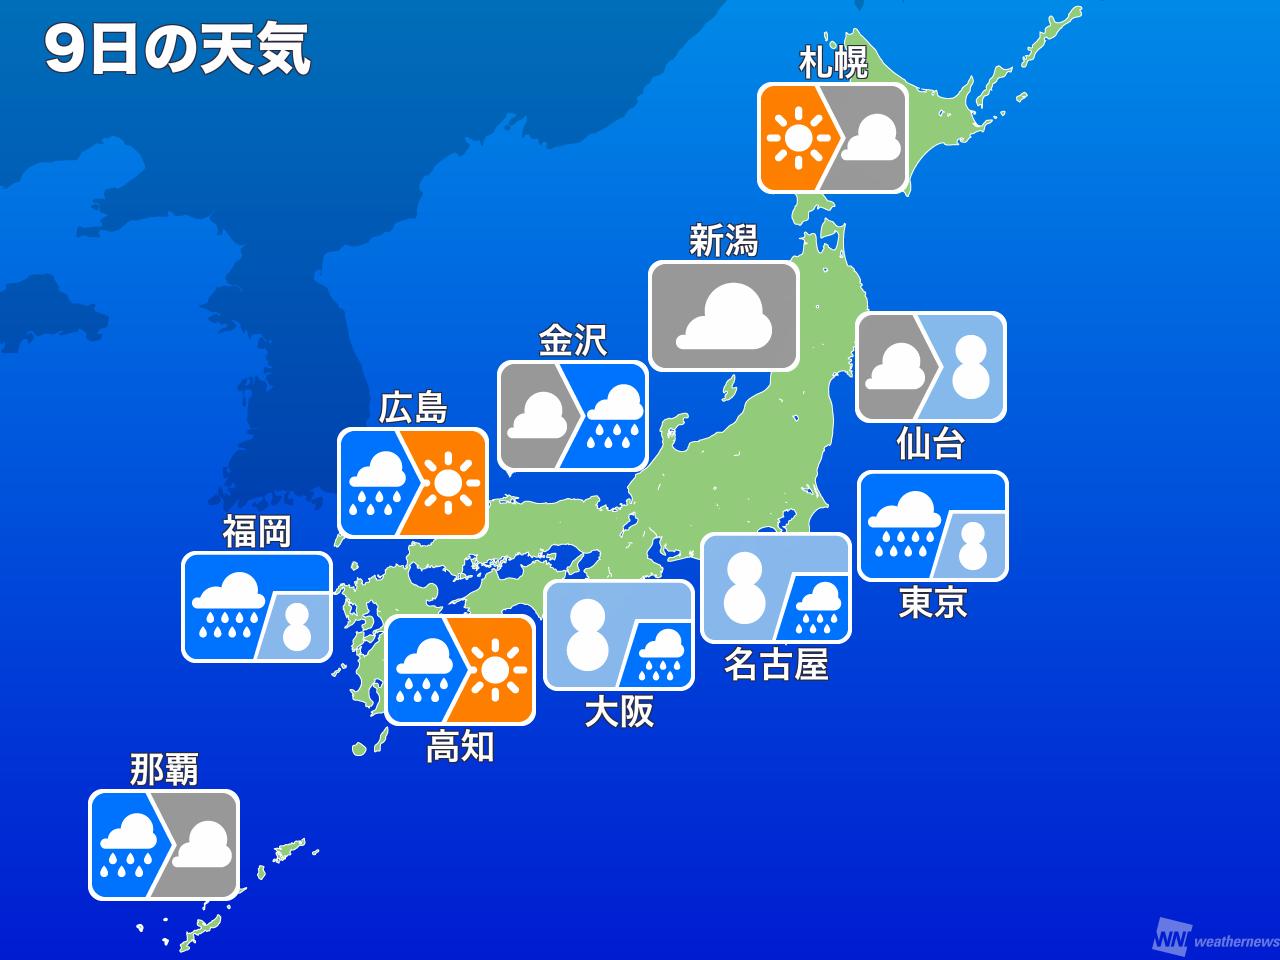 Sunny Spot 天気・気象情報サイト!